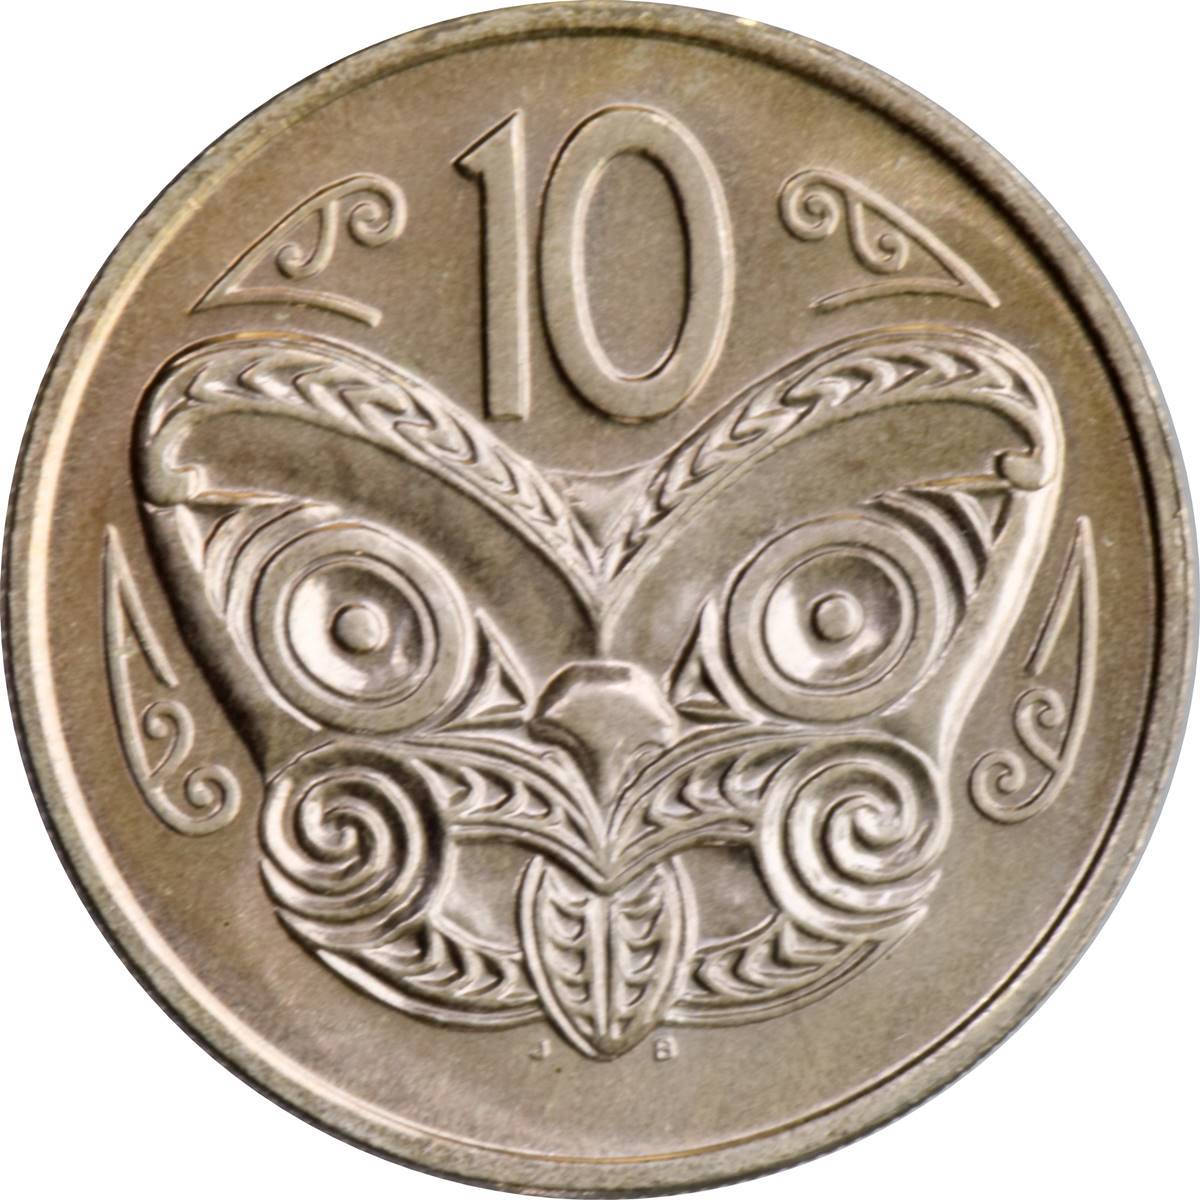 New Zealand Dollar Coin 1975 UNC